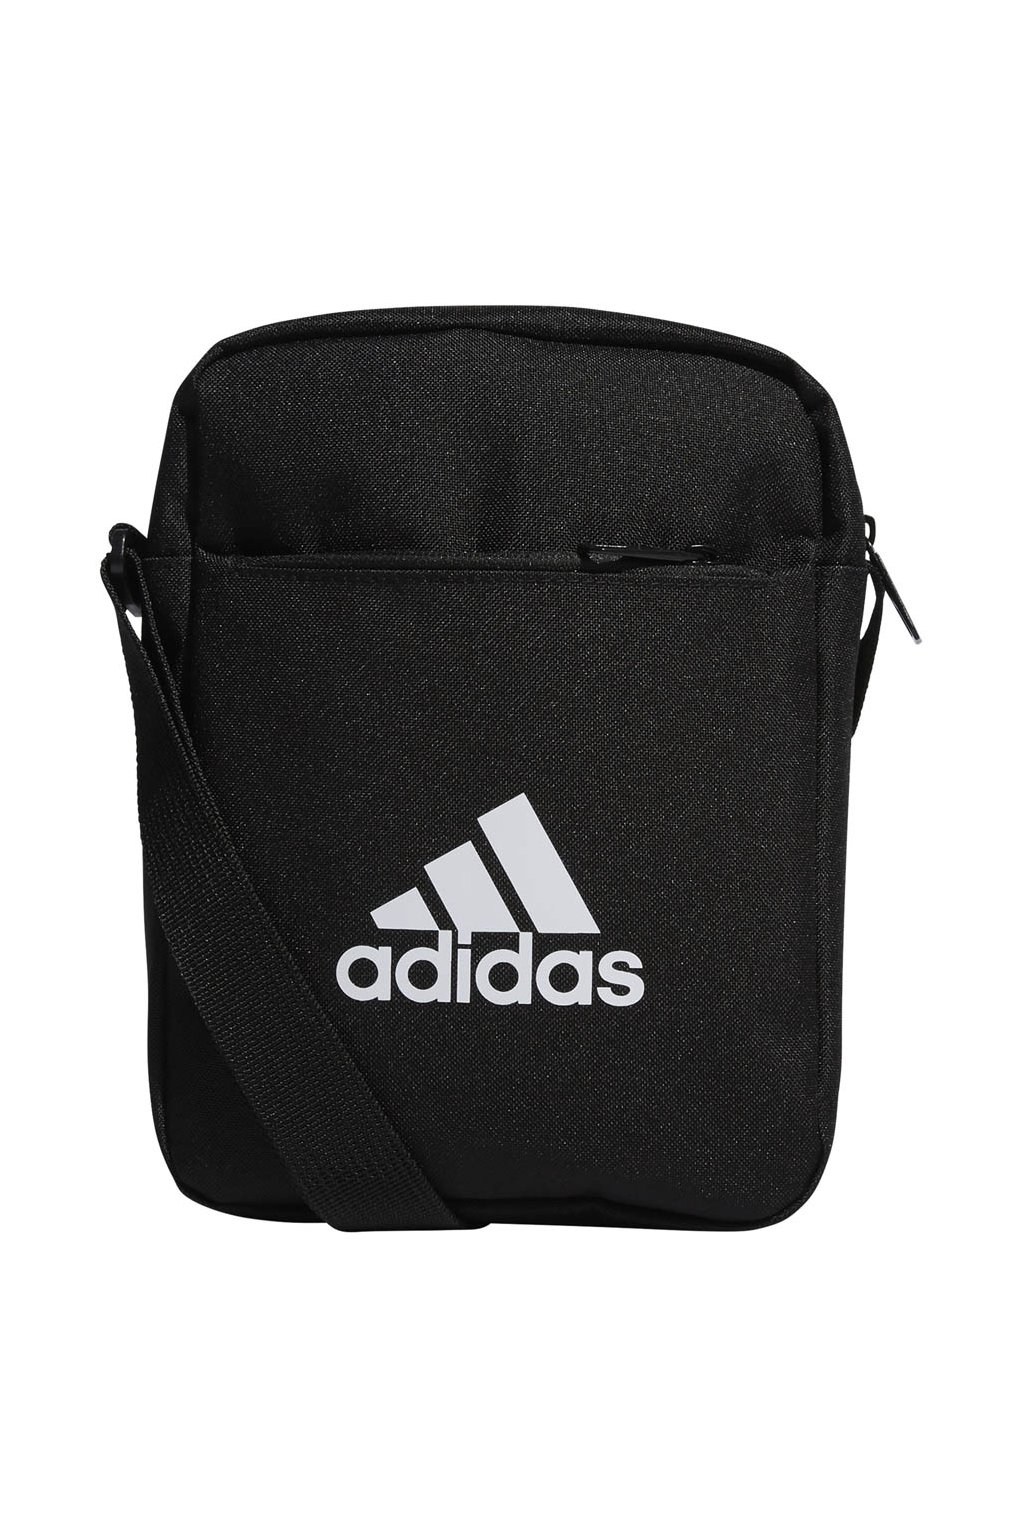 Taška Adidas EC Organizer čierna ED6877